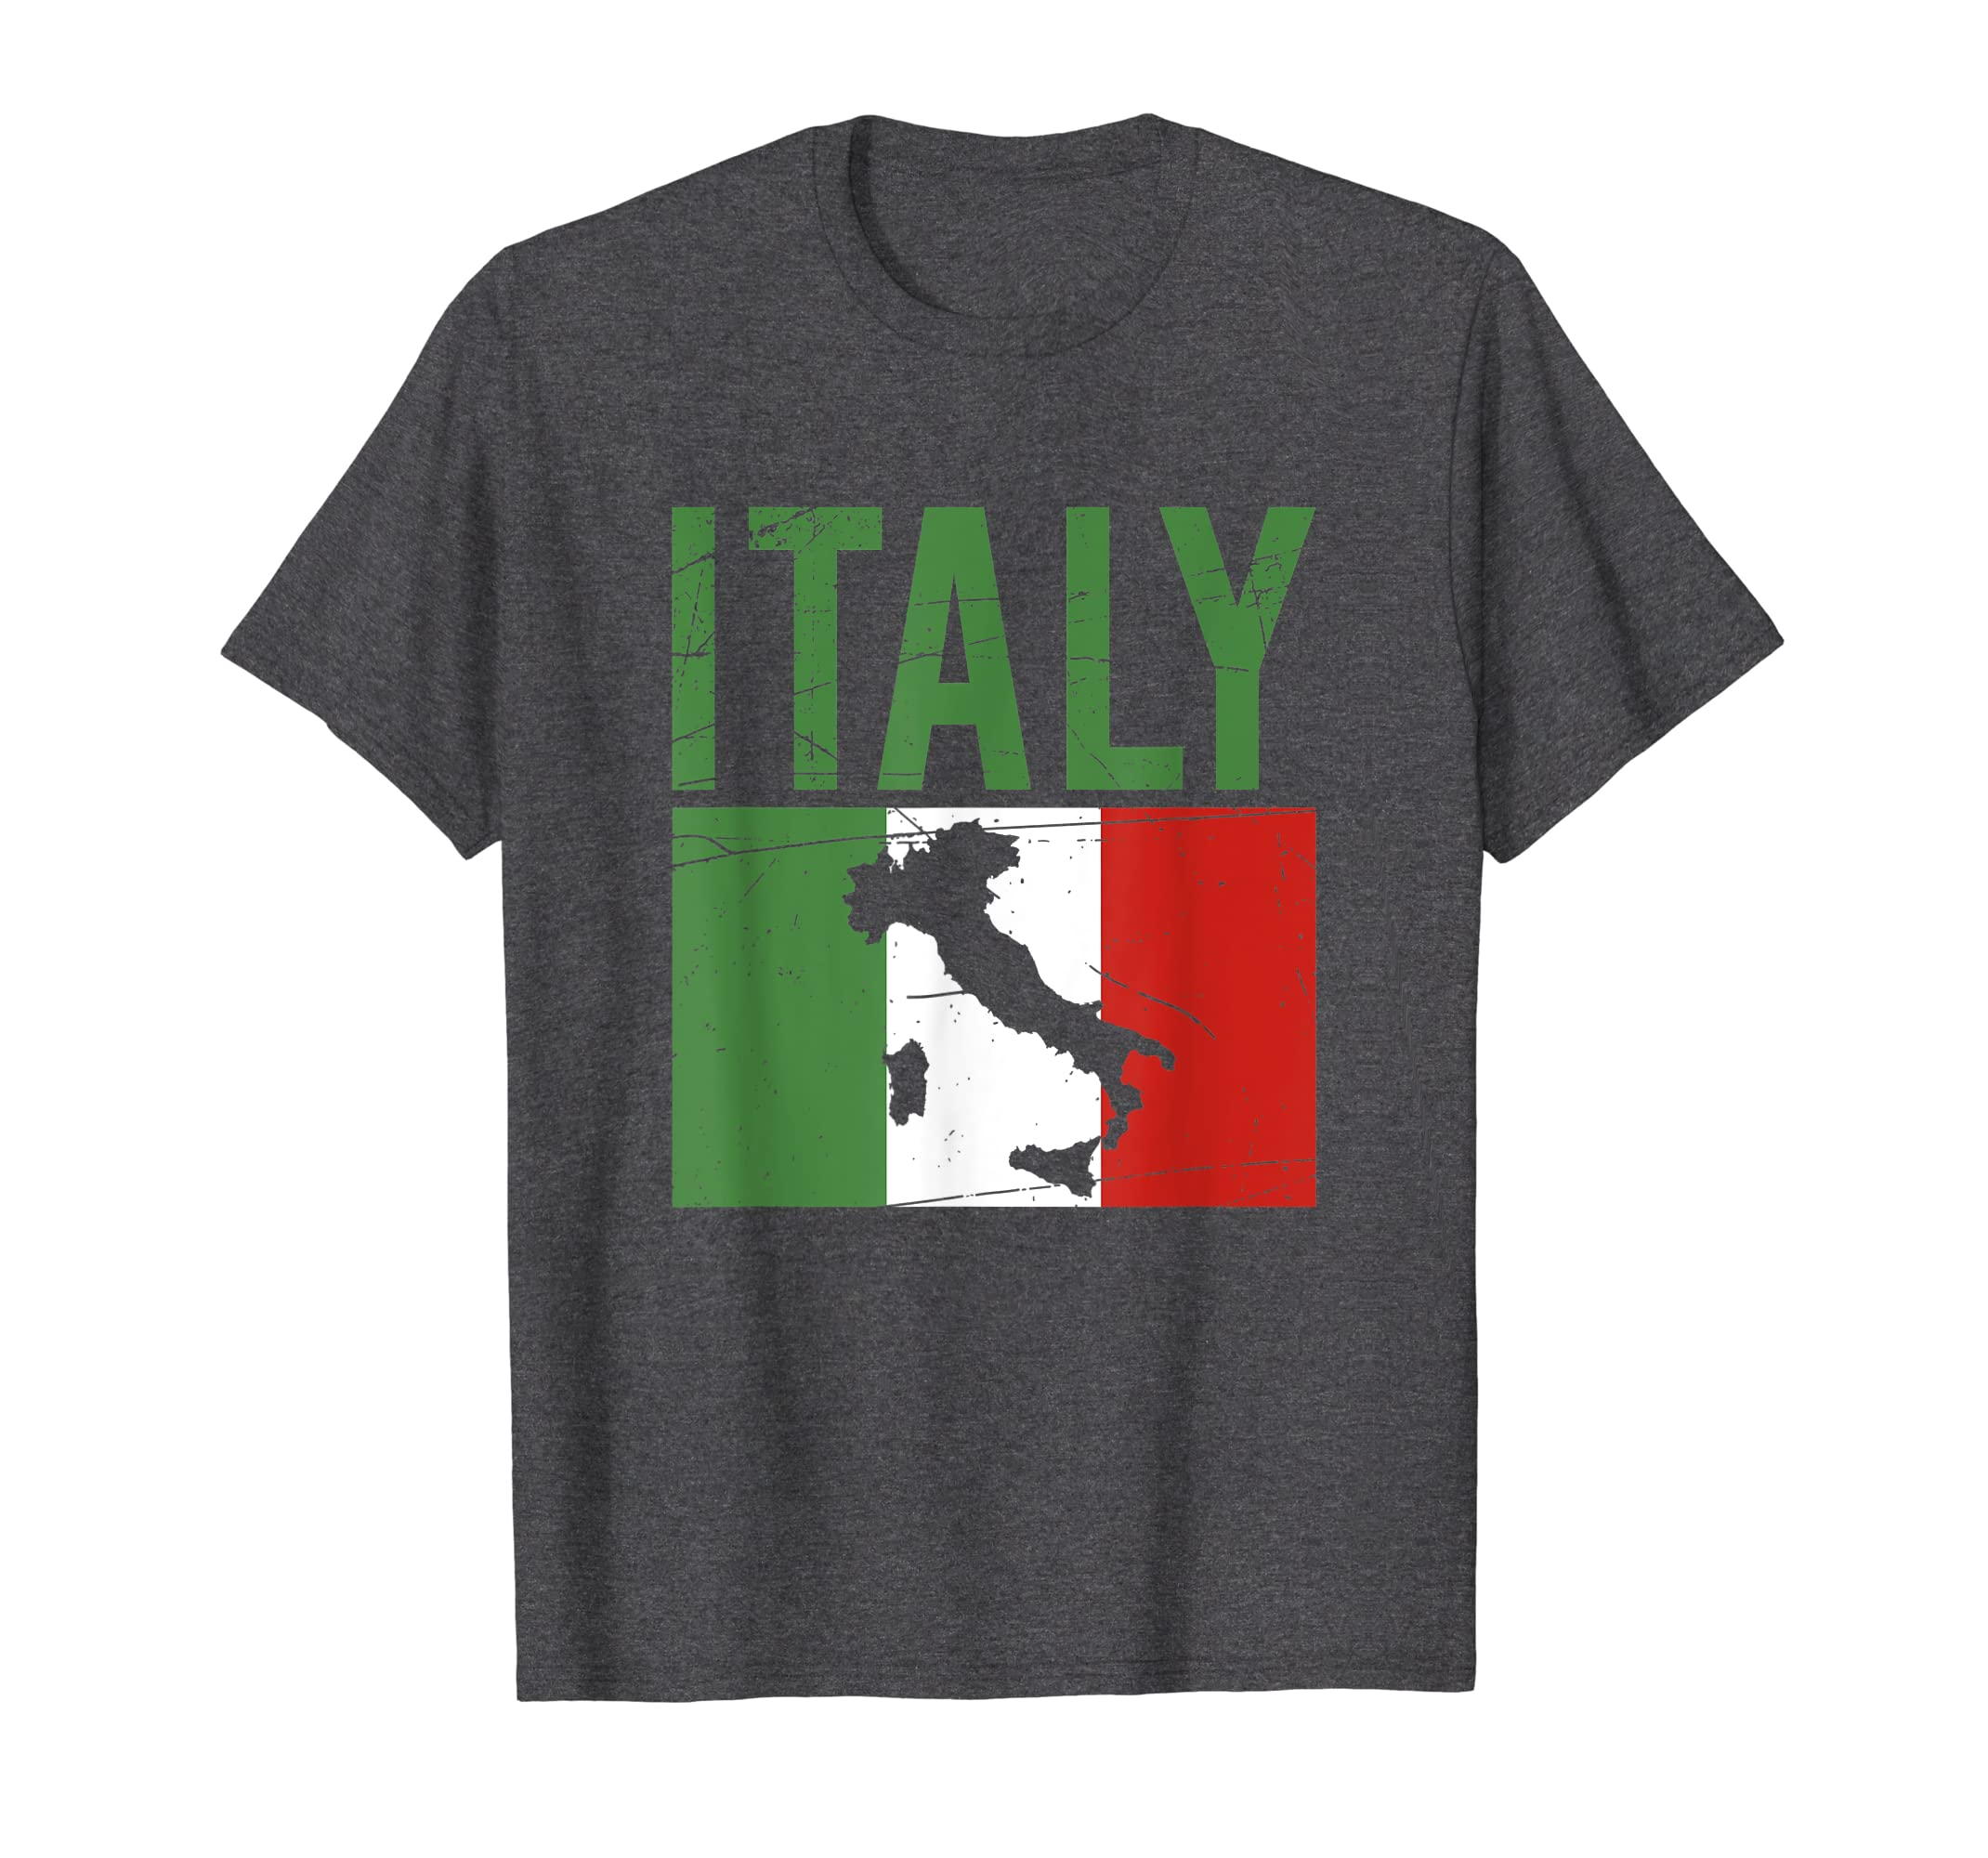 8b531c20586 Amazon.com: Italia Vacation Family Travel T-Shirt I Summer Tourist ...